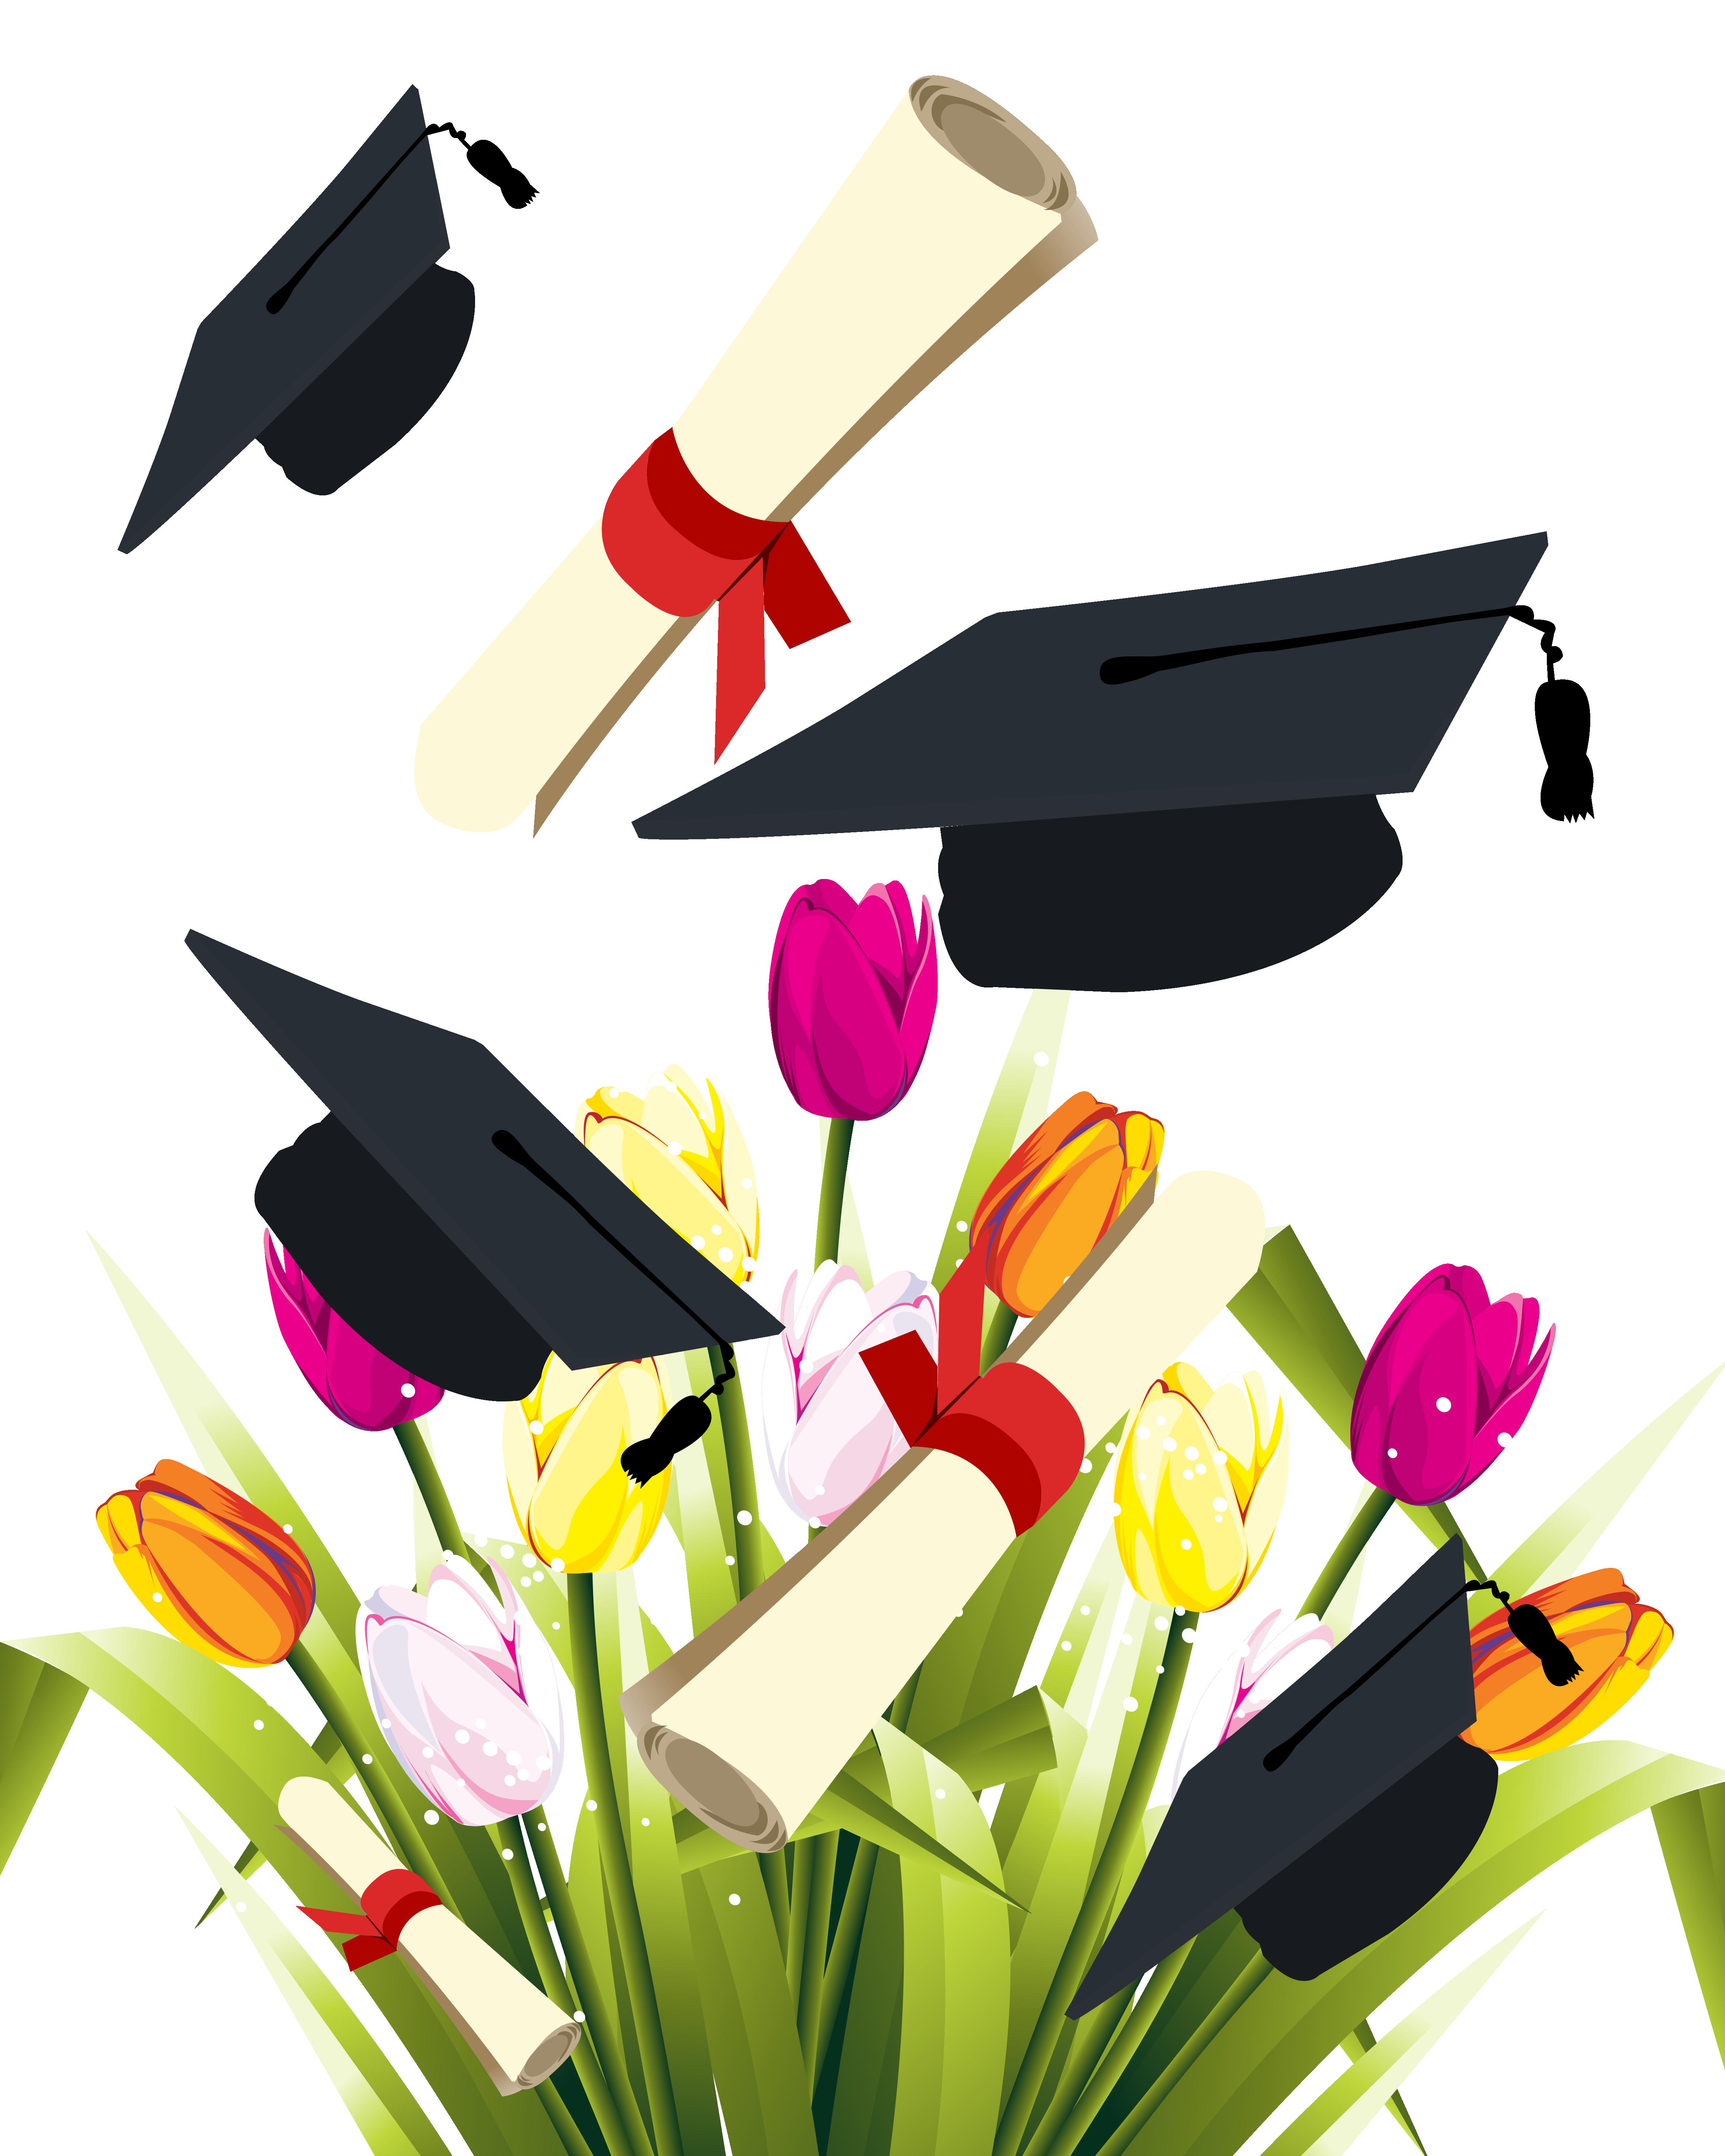 Diploma clipart graduation flower. Ceremony square academic cap